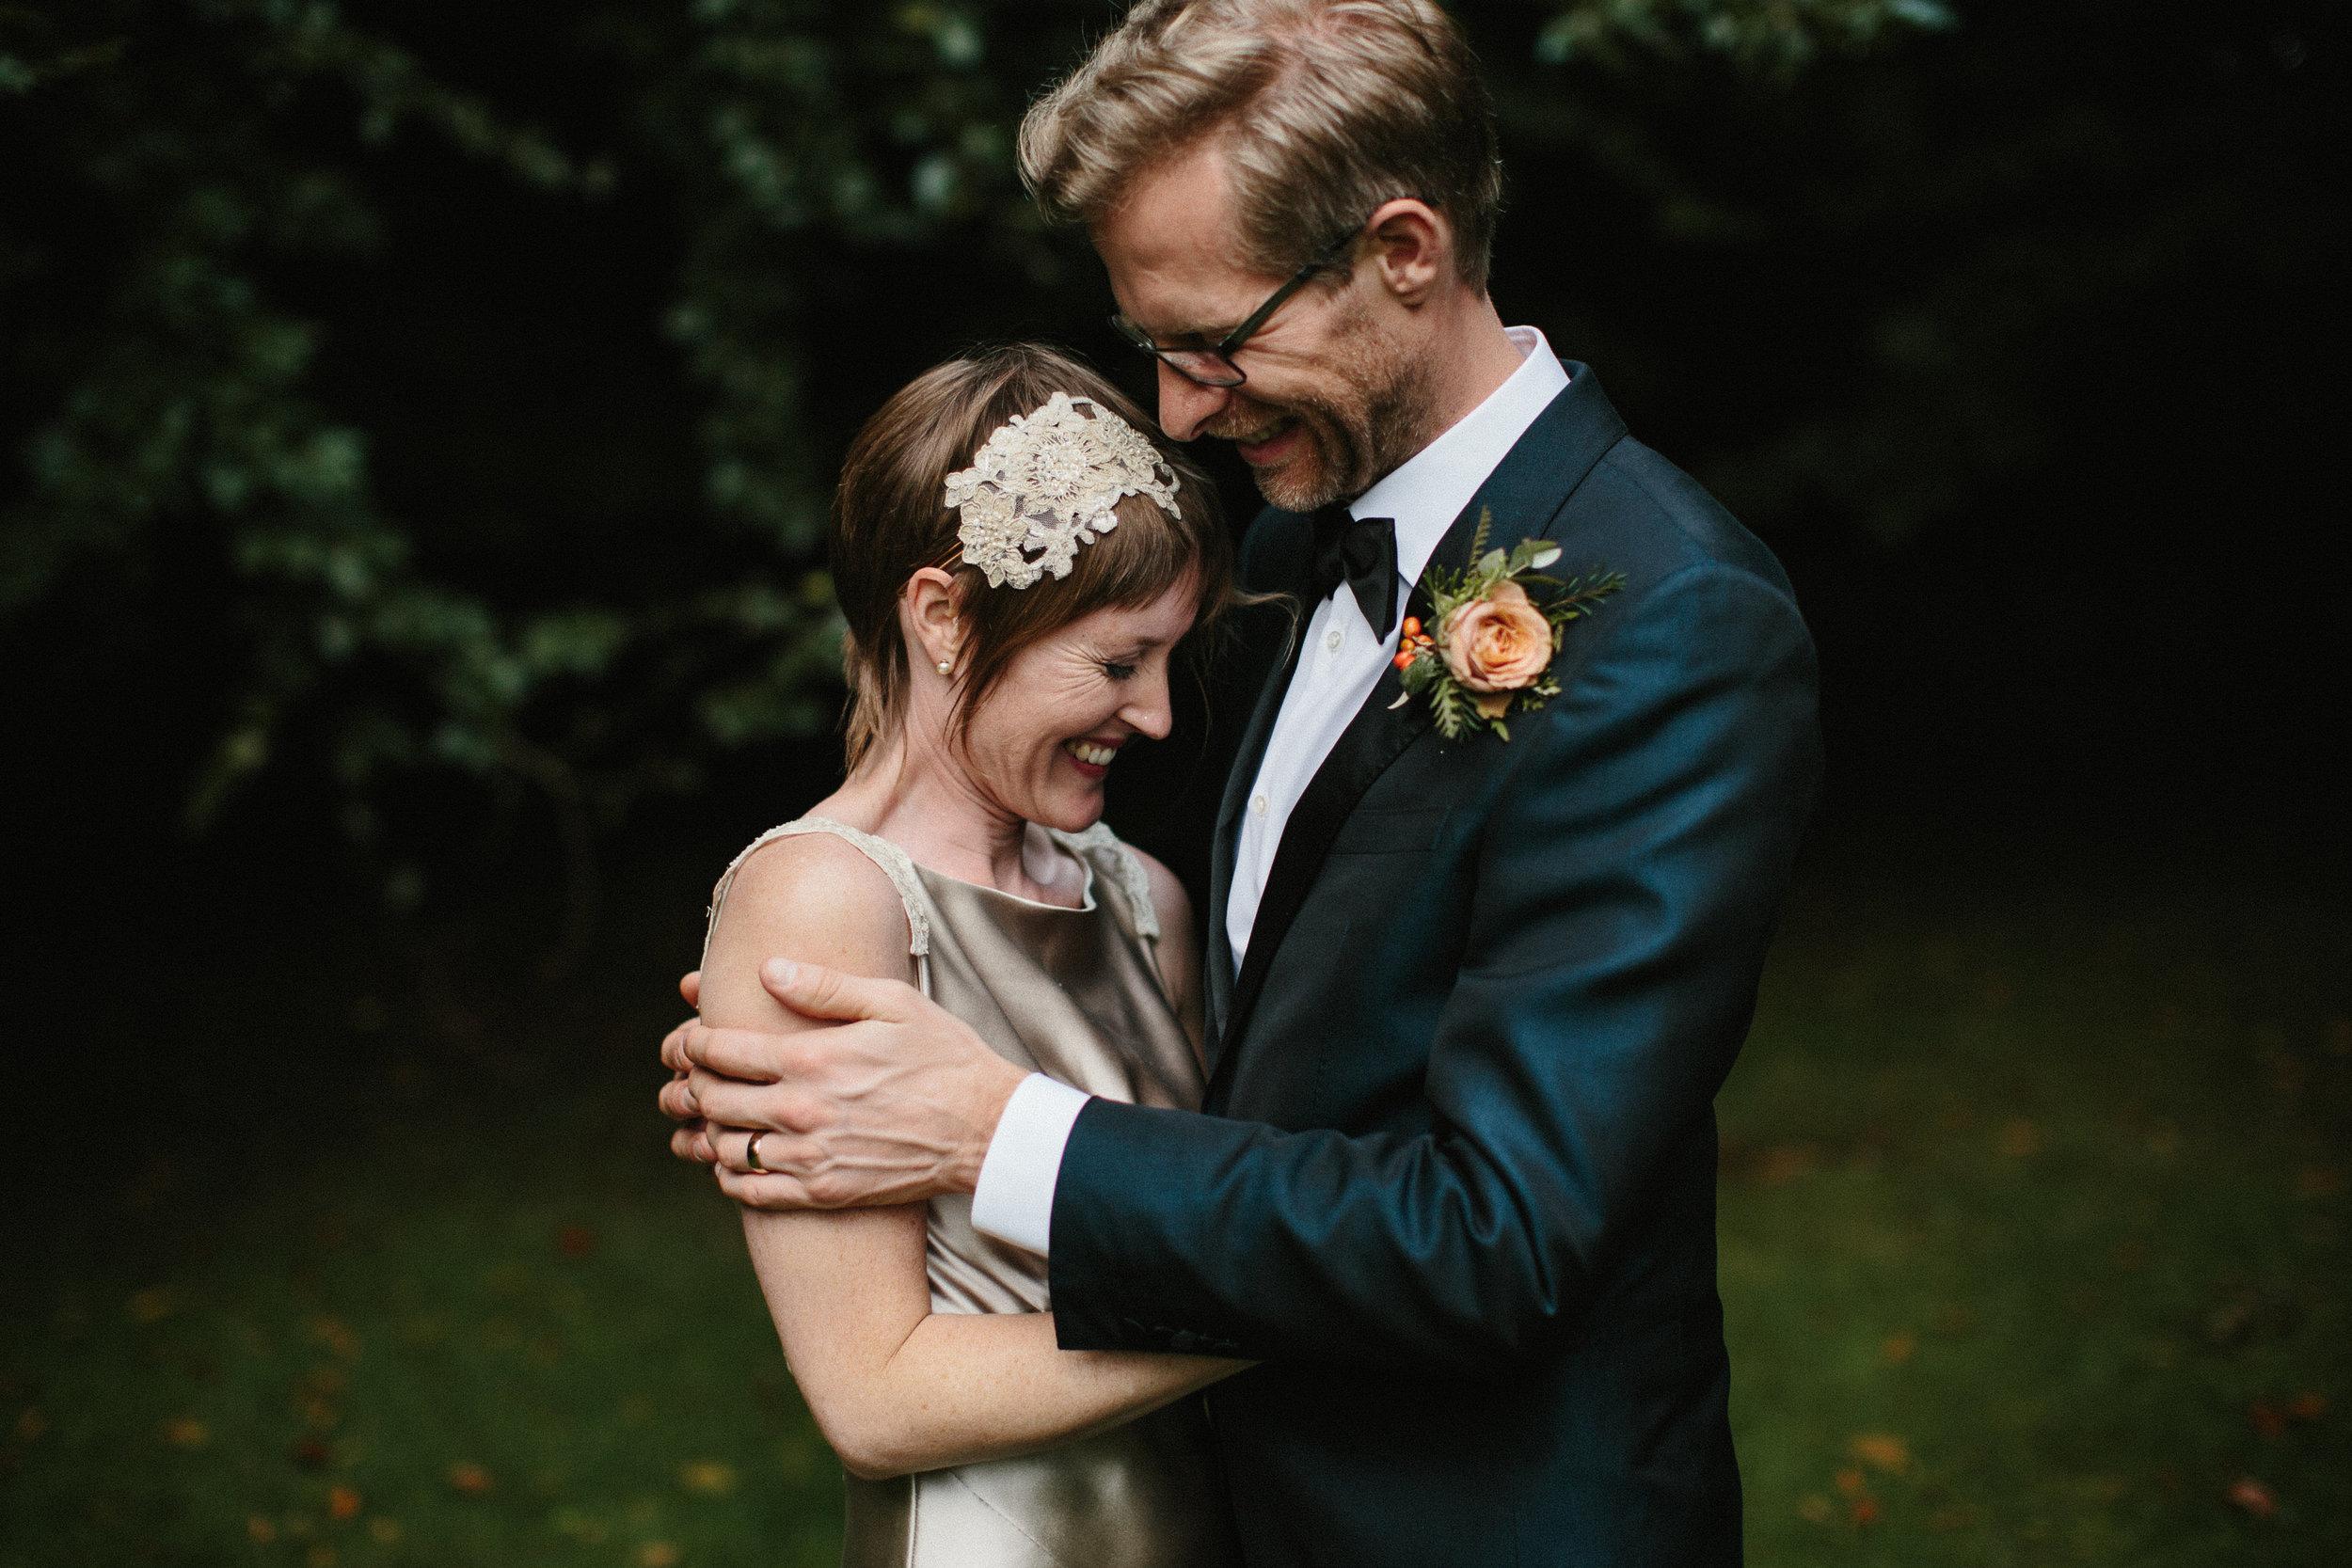 Kate-Beaumont-Sheffield-Honeysuckle-bias-cut-wedding-dress-oyster-Rosie36.jpg